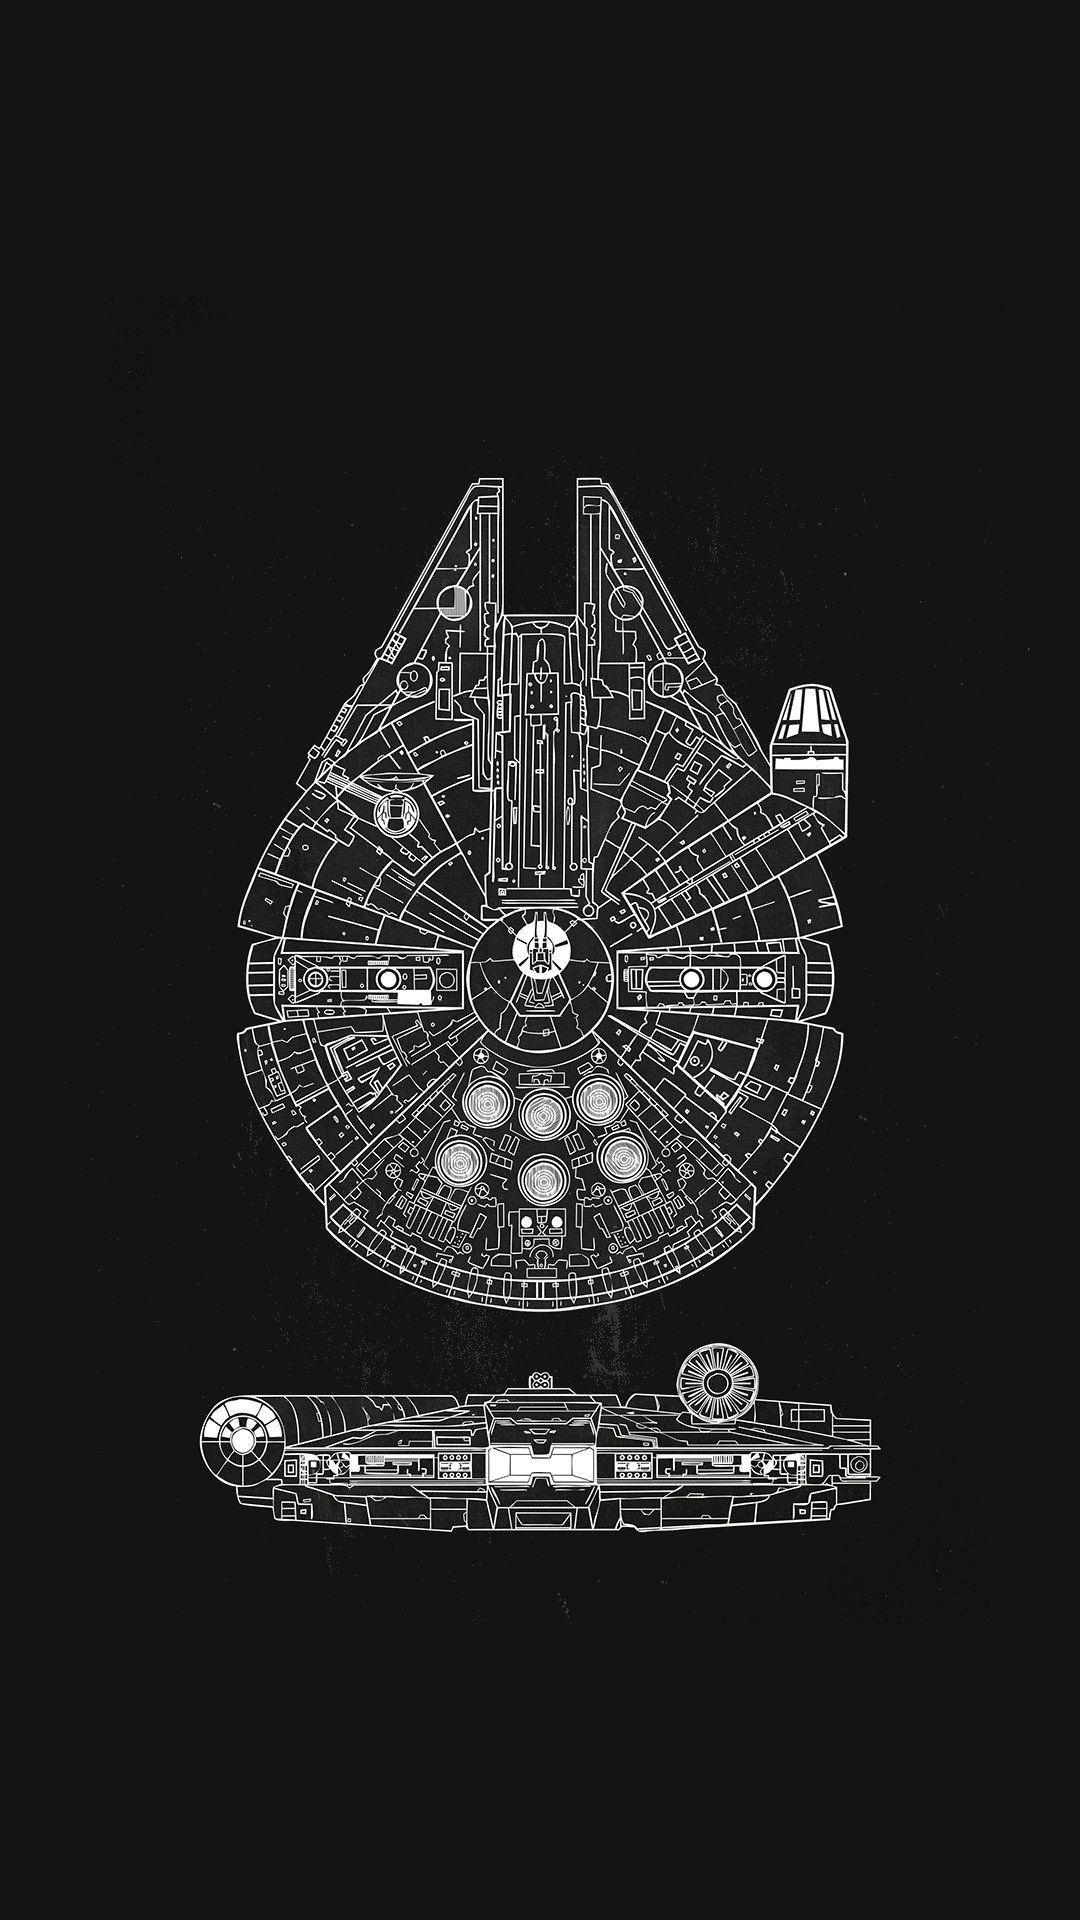 Star Wars Blueprints Wallpaper Wallpapers For Tech